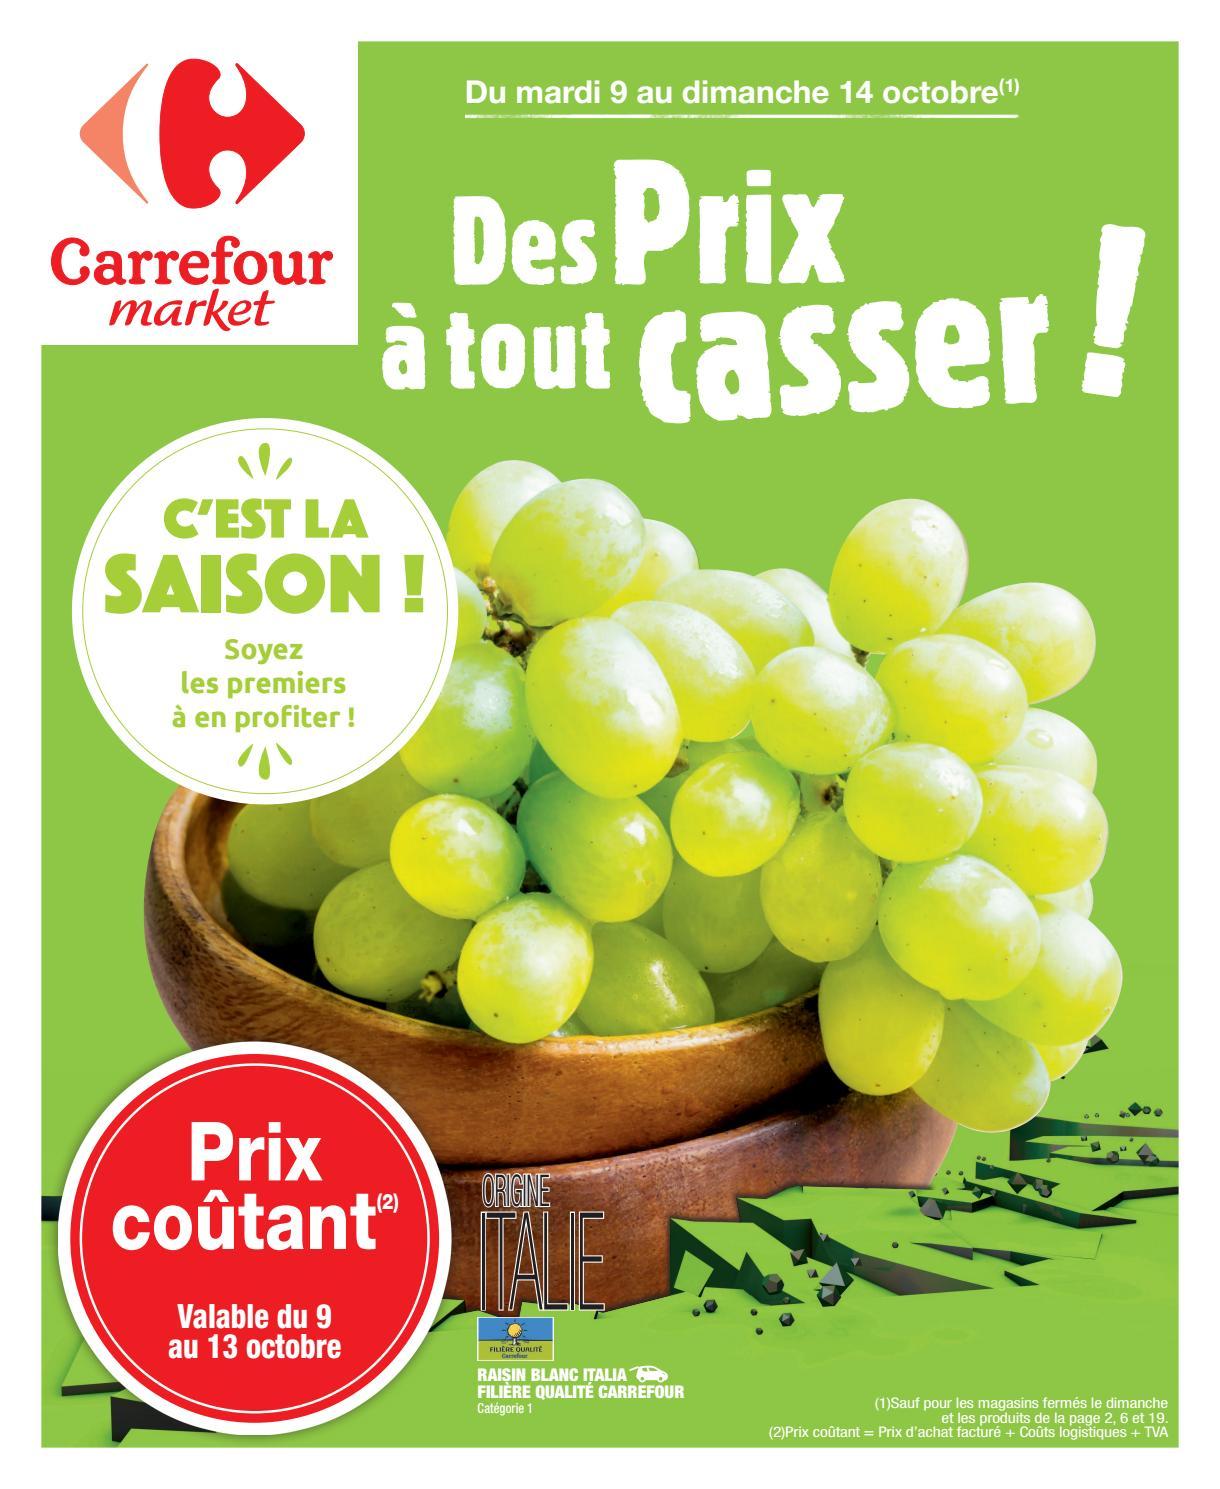 Catalogue Carrefour Market Du 09 Au 14 Octobre 2018 Monsieurechantillons Com By Monsieurechantillons Fr Issuu